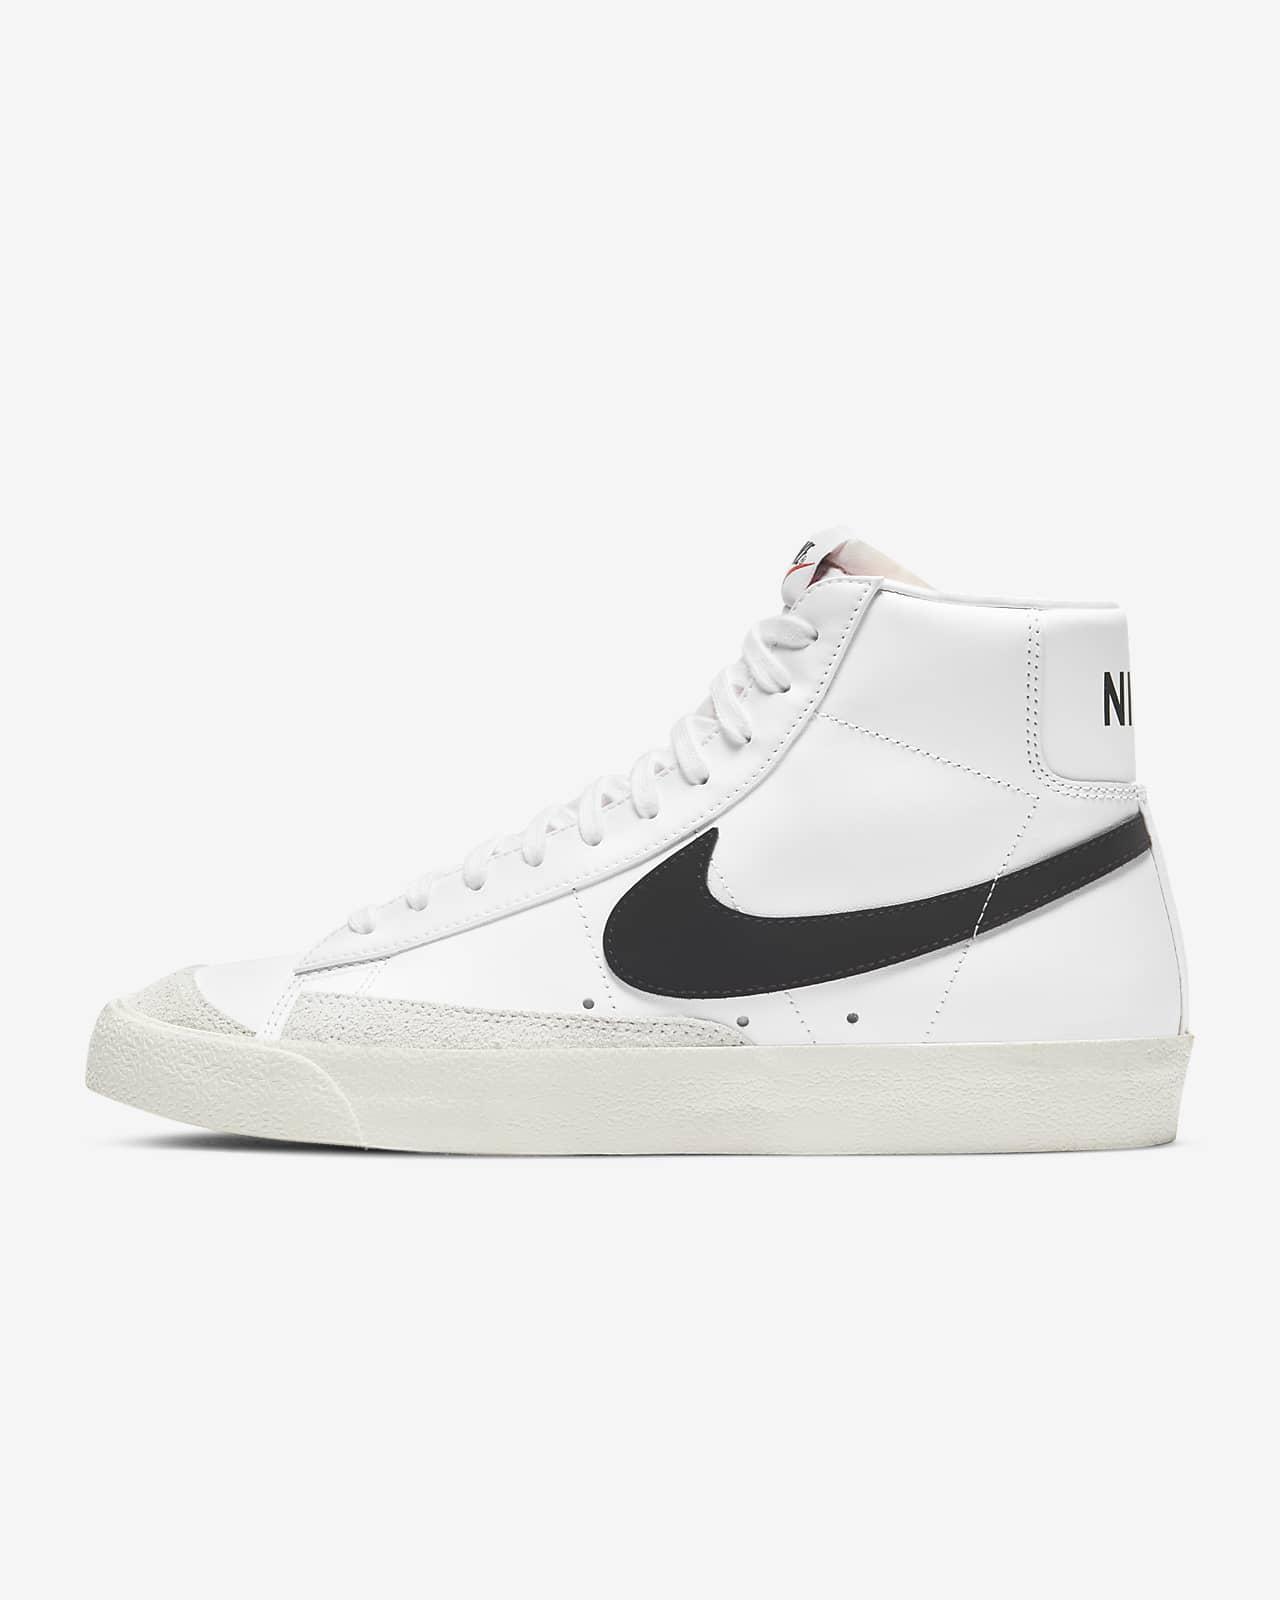 Pánská bota Nike Blazer Mid '77 Vintage